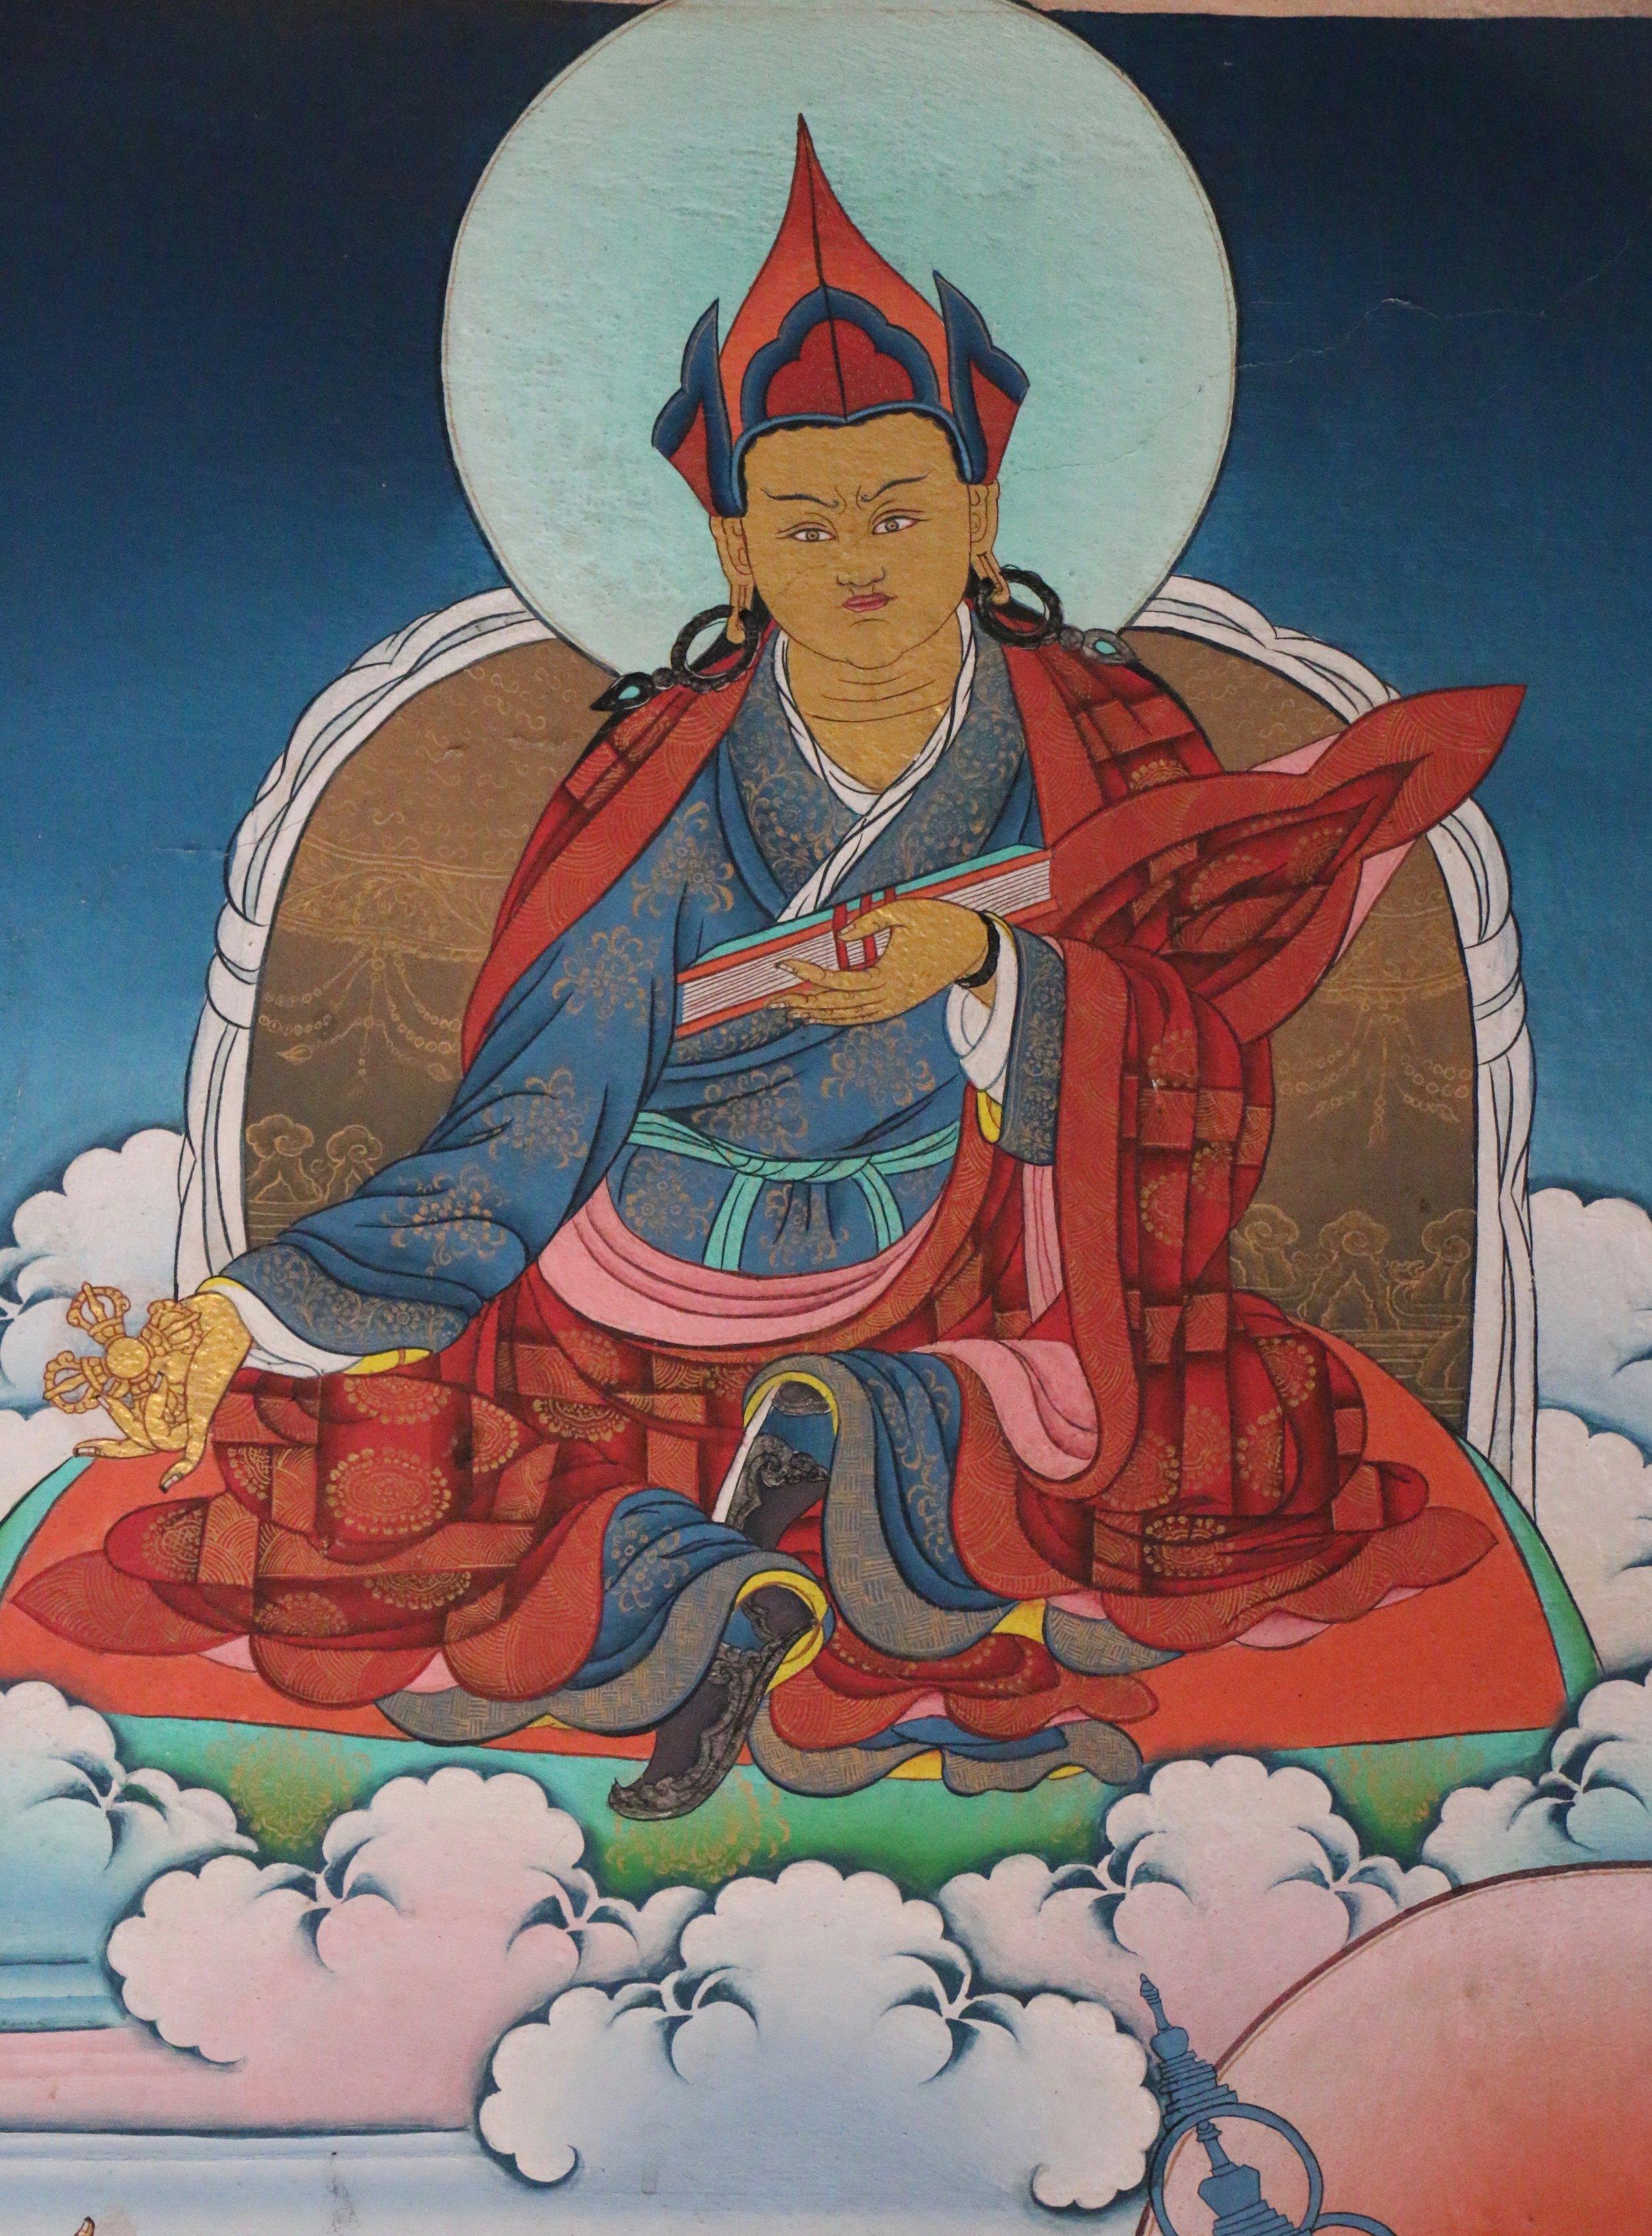 ✔️Prabhahasti (one of 8 Vidyadharas)